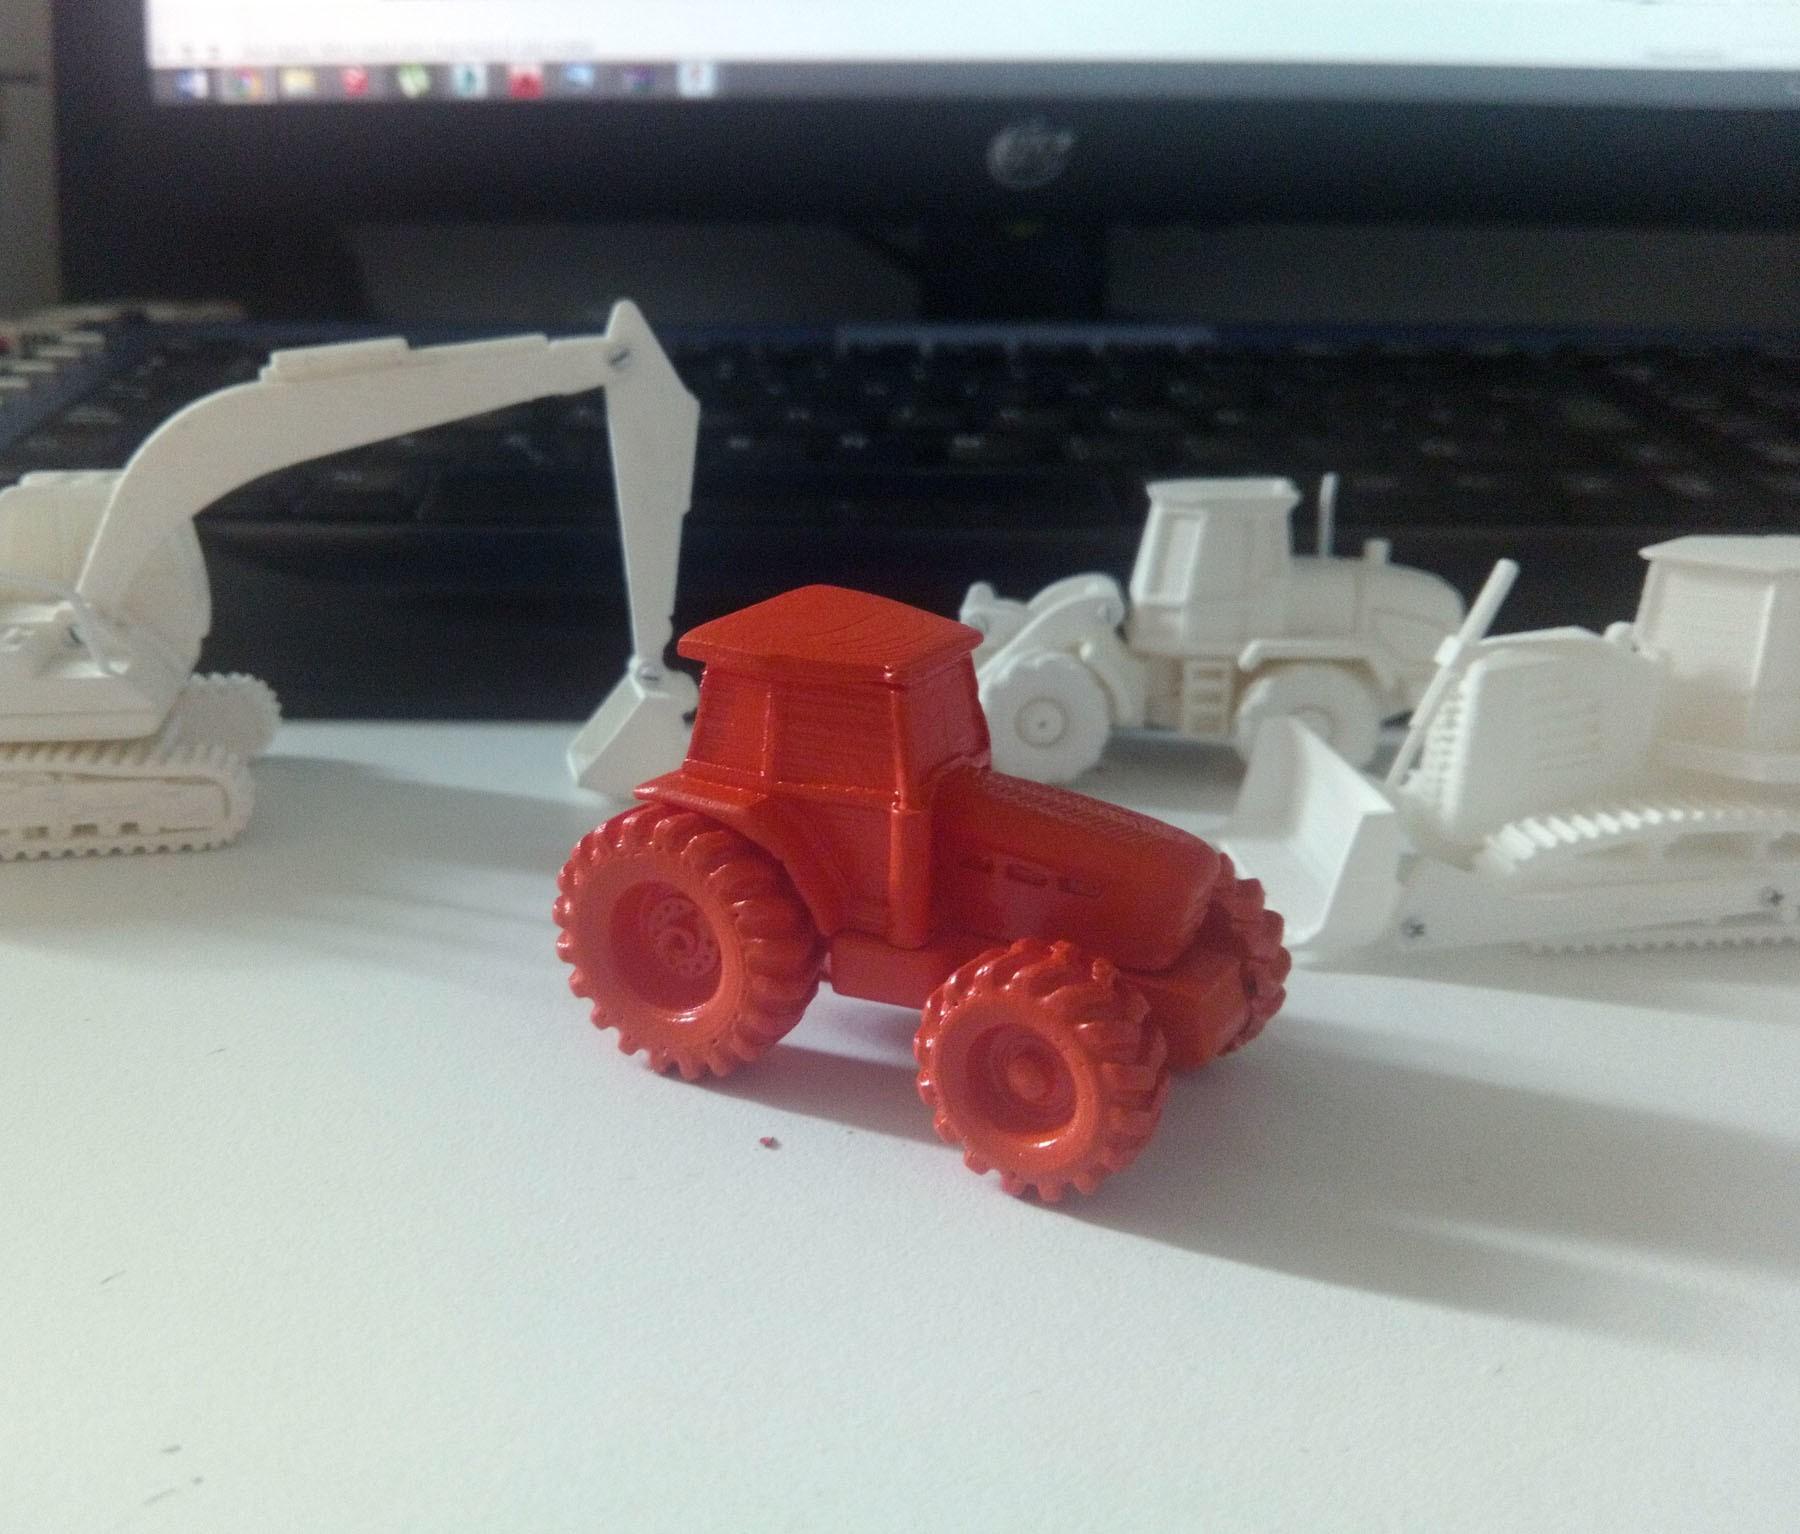 IMG_20170513_163338 p.jpg Download free STL file Easy to print Generic Tractor (esc: 1: 100) • 3D printing template, guaro3d